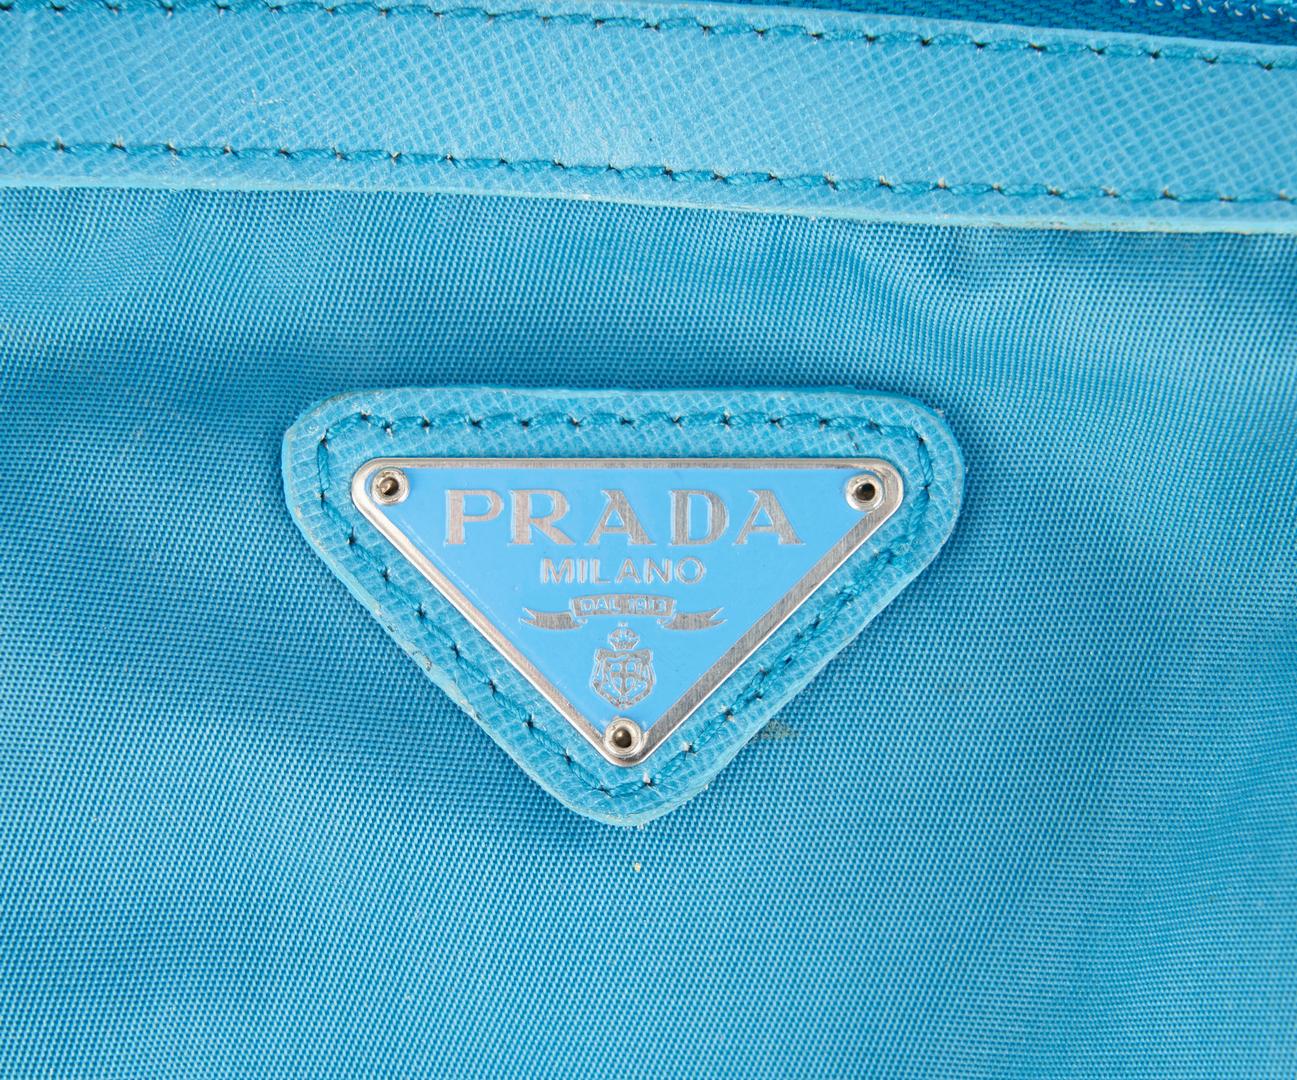 Lot 718: 4 Prada Items, incl. 2 Tessuto Hobo Bags